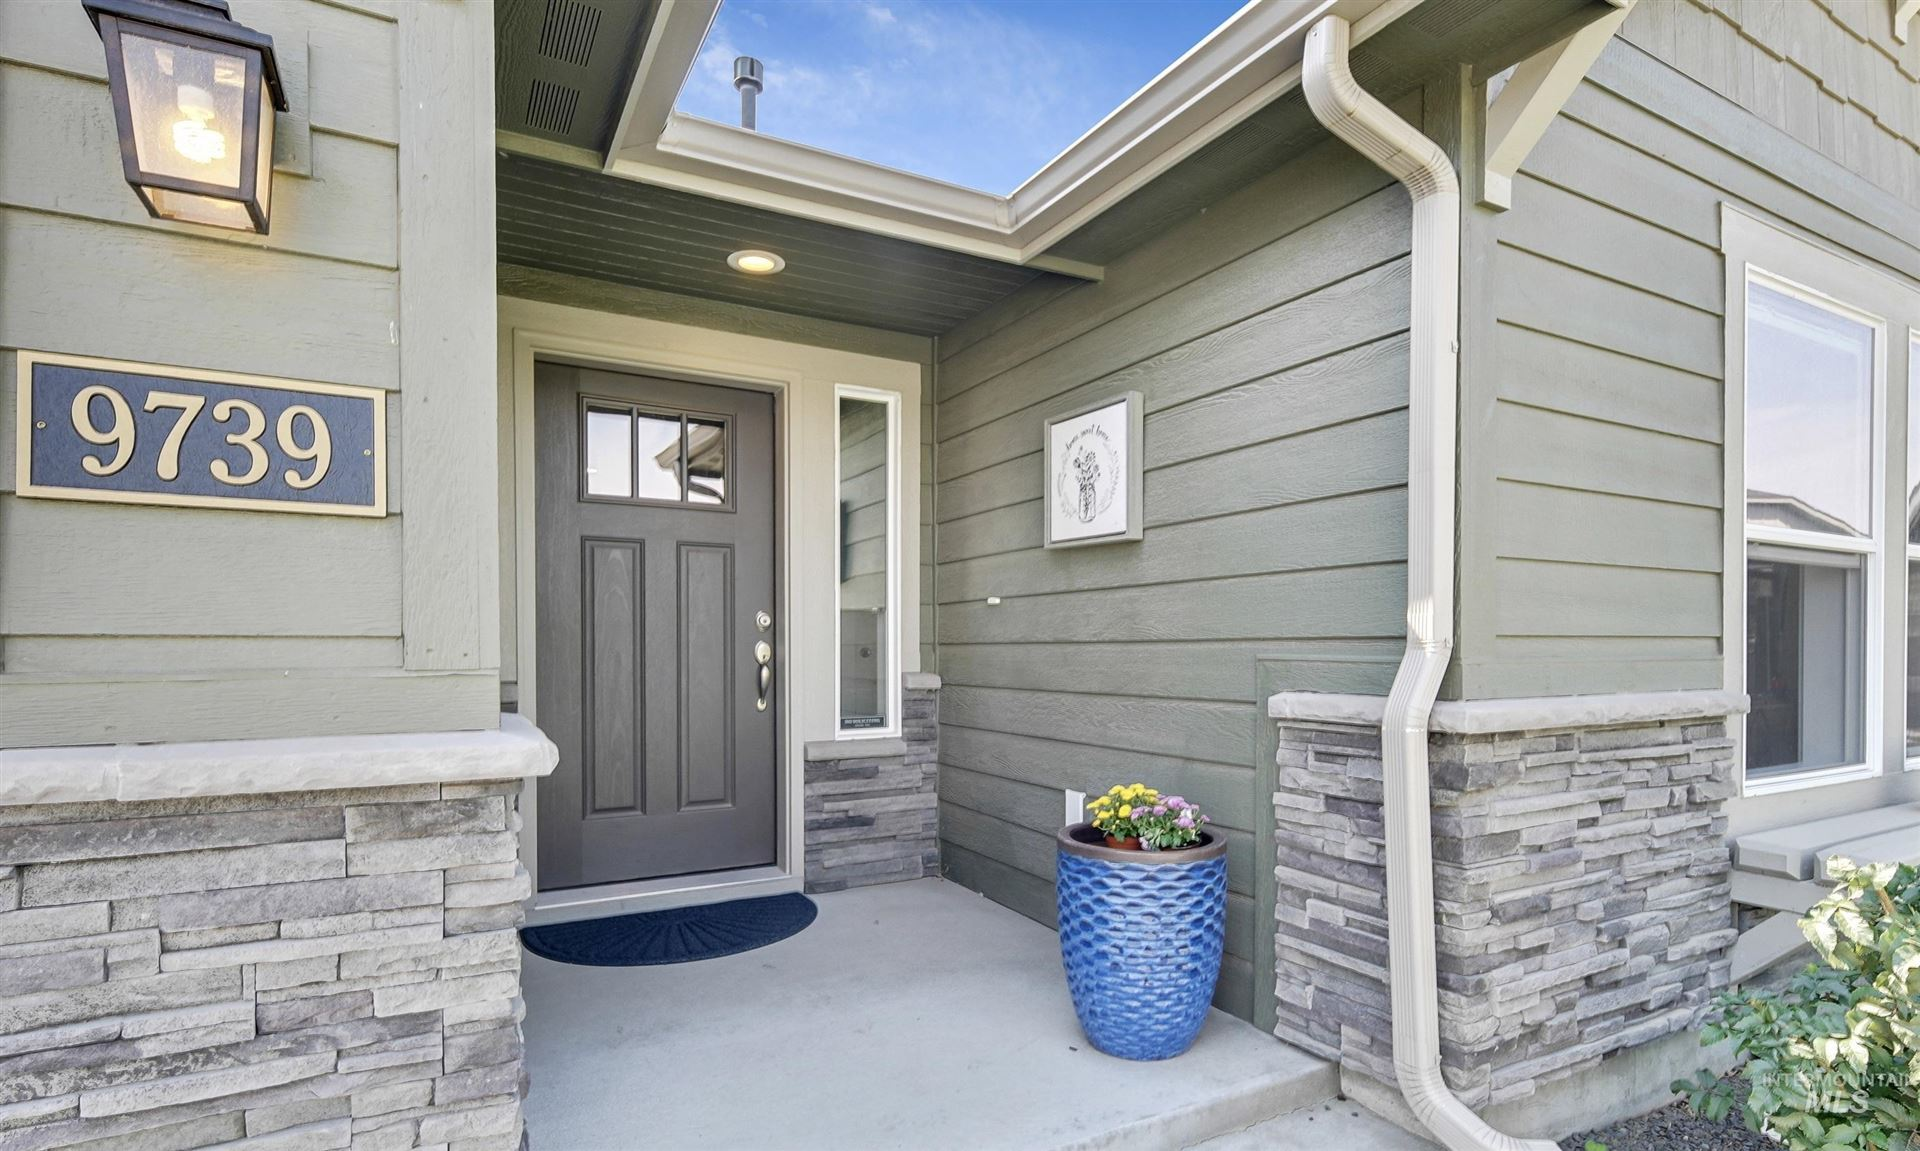 Photo of 9739 W Goldenpond Street, Boise, ID 83709 (MLS # 98819348)